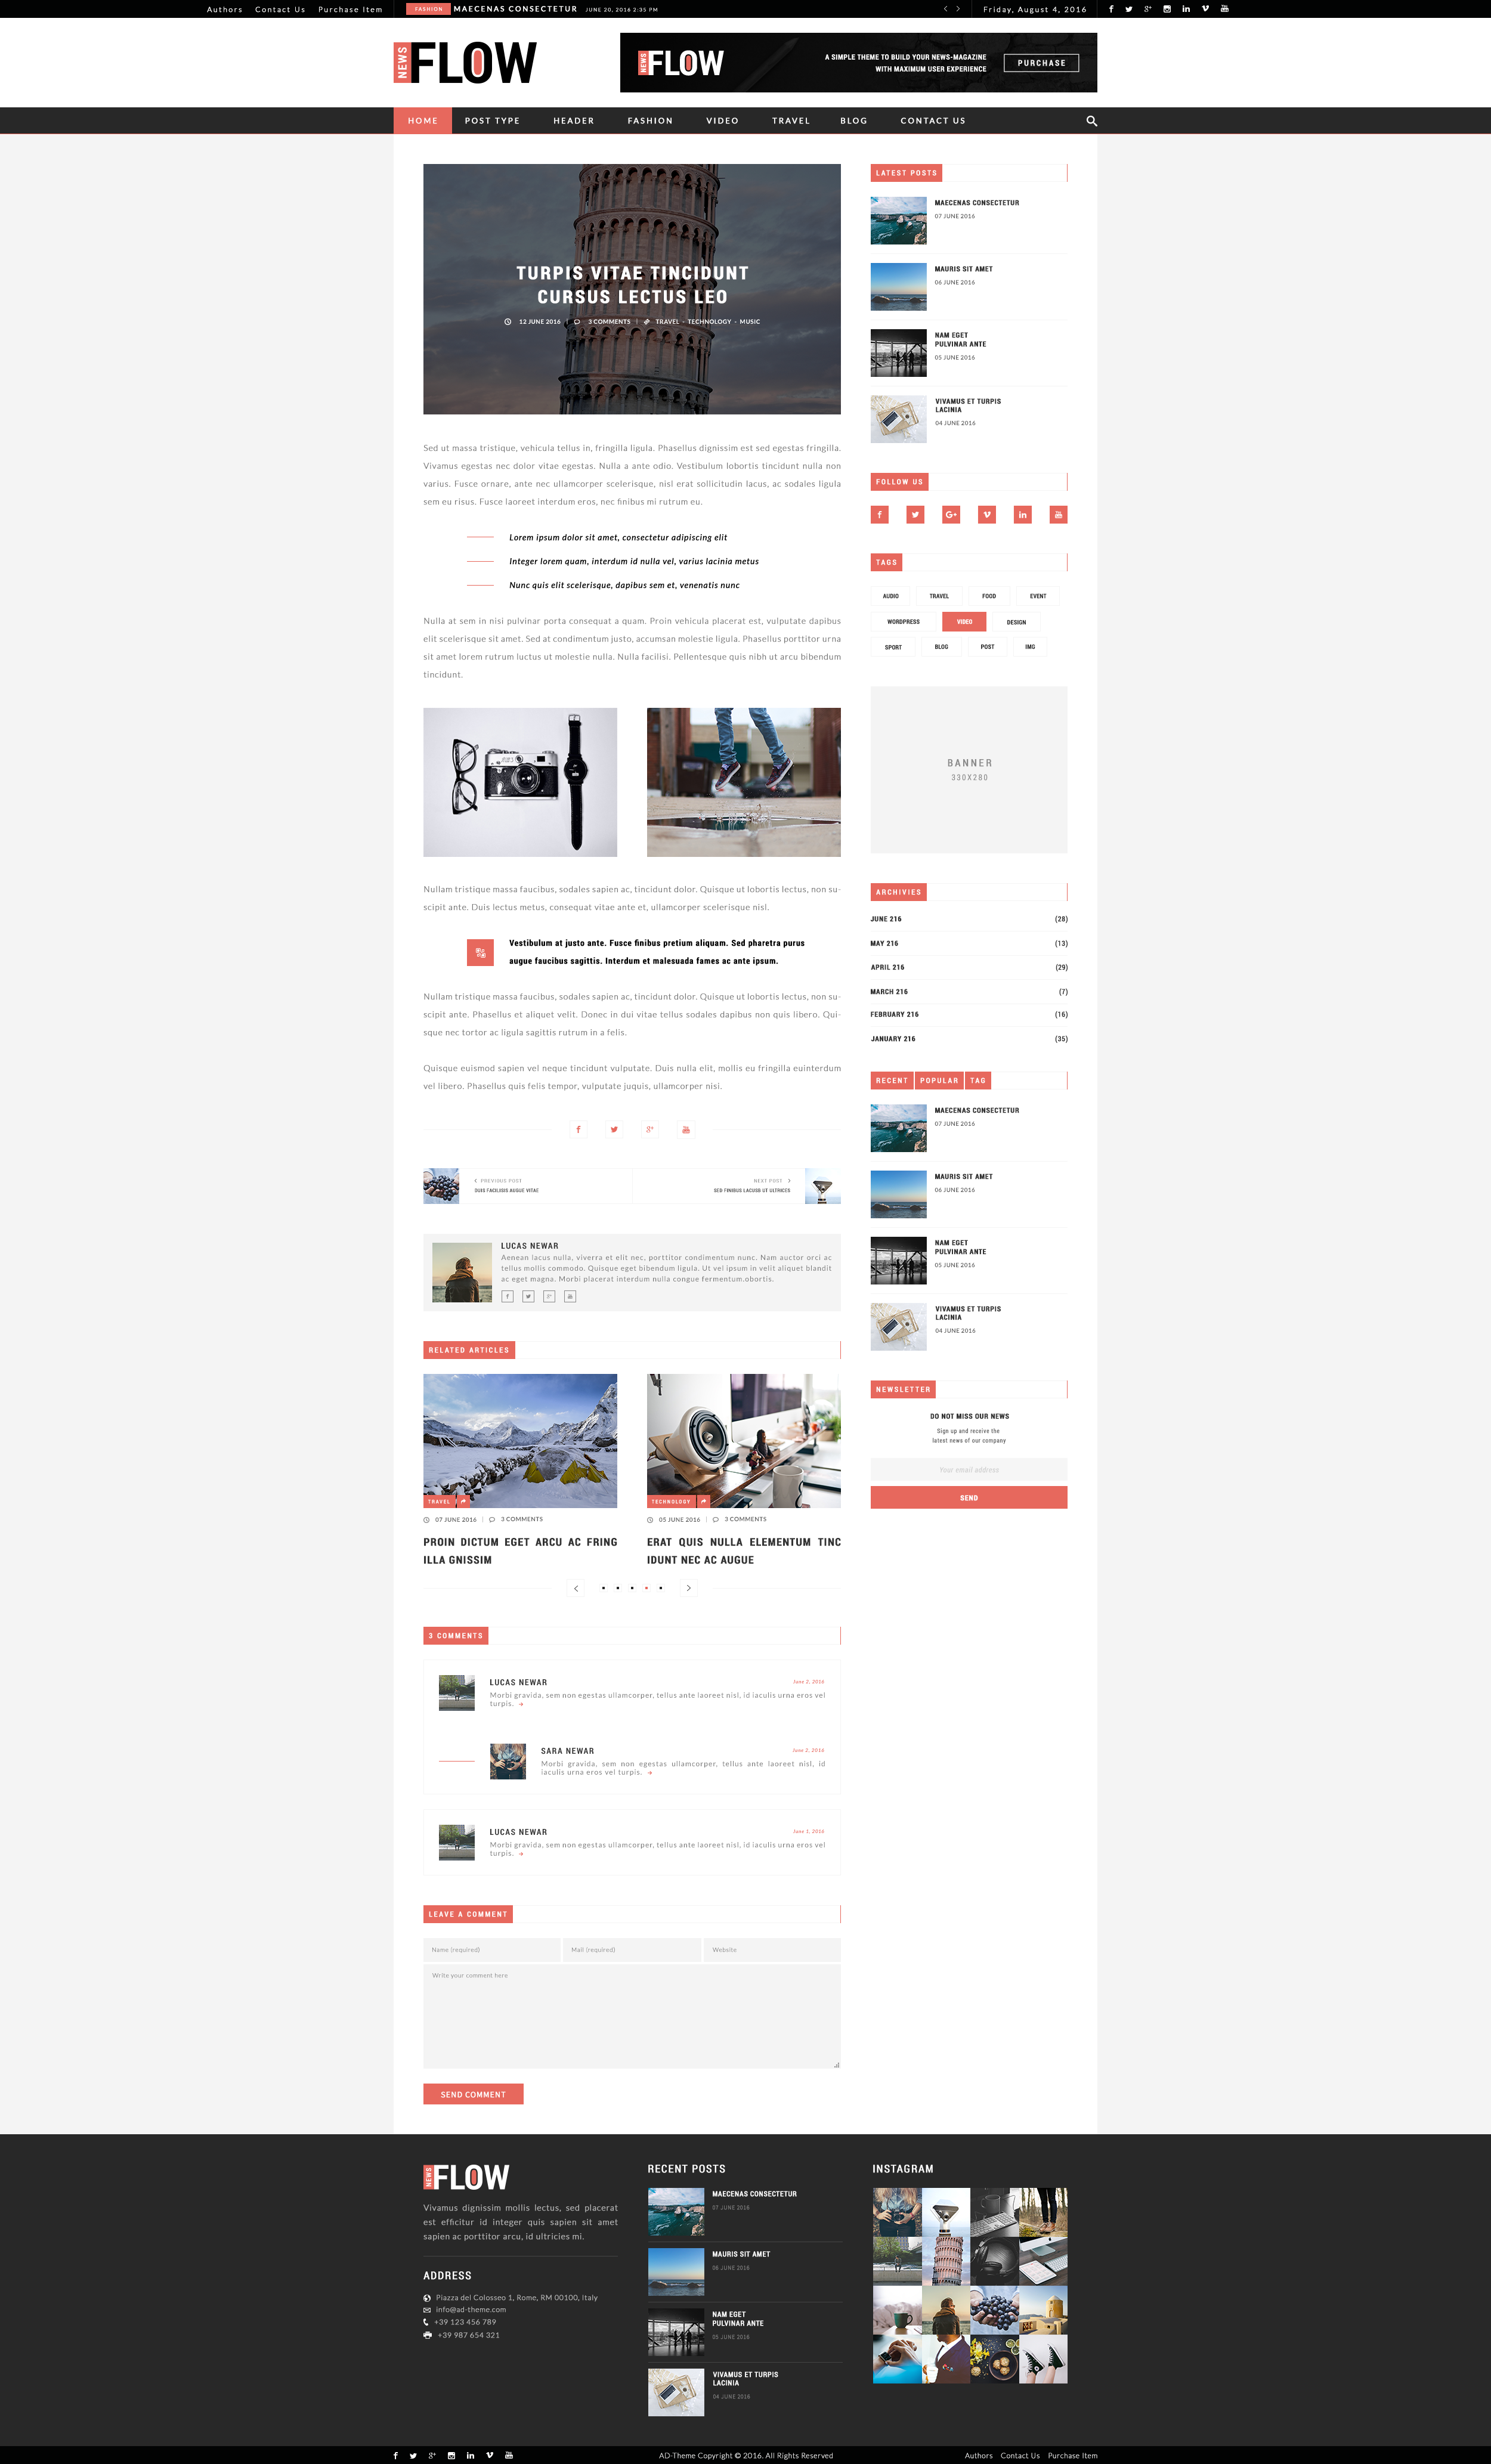 FlowNews News And Magazine PSD Template By Adtheme ThemeForest - News website design template